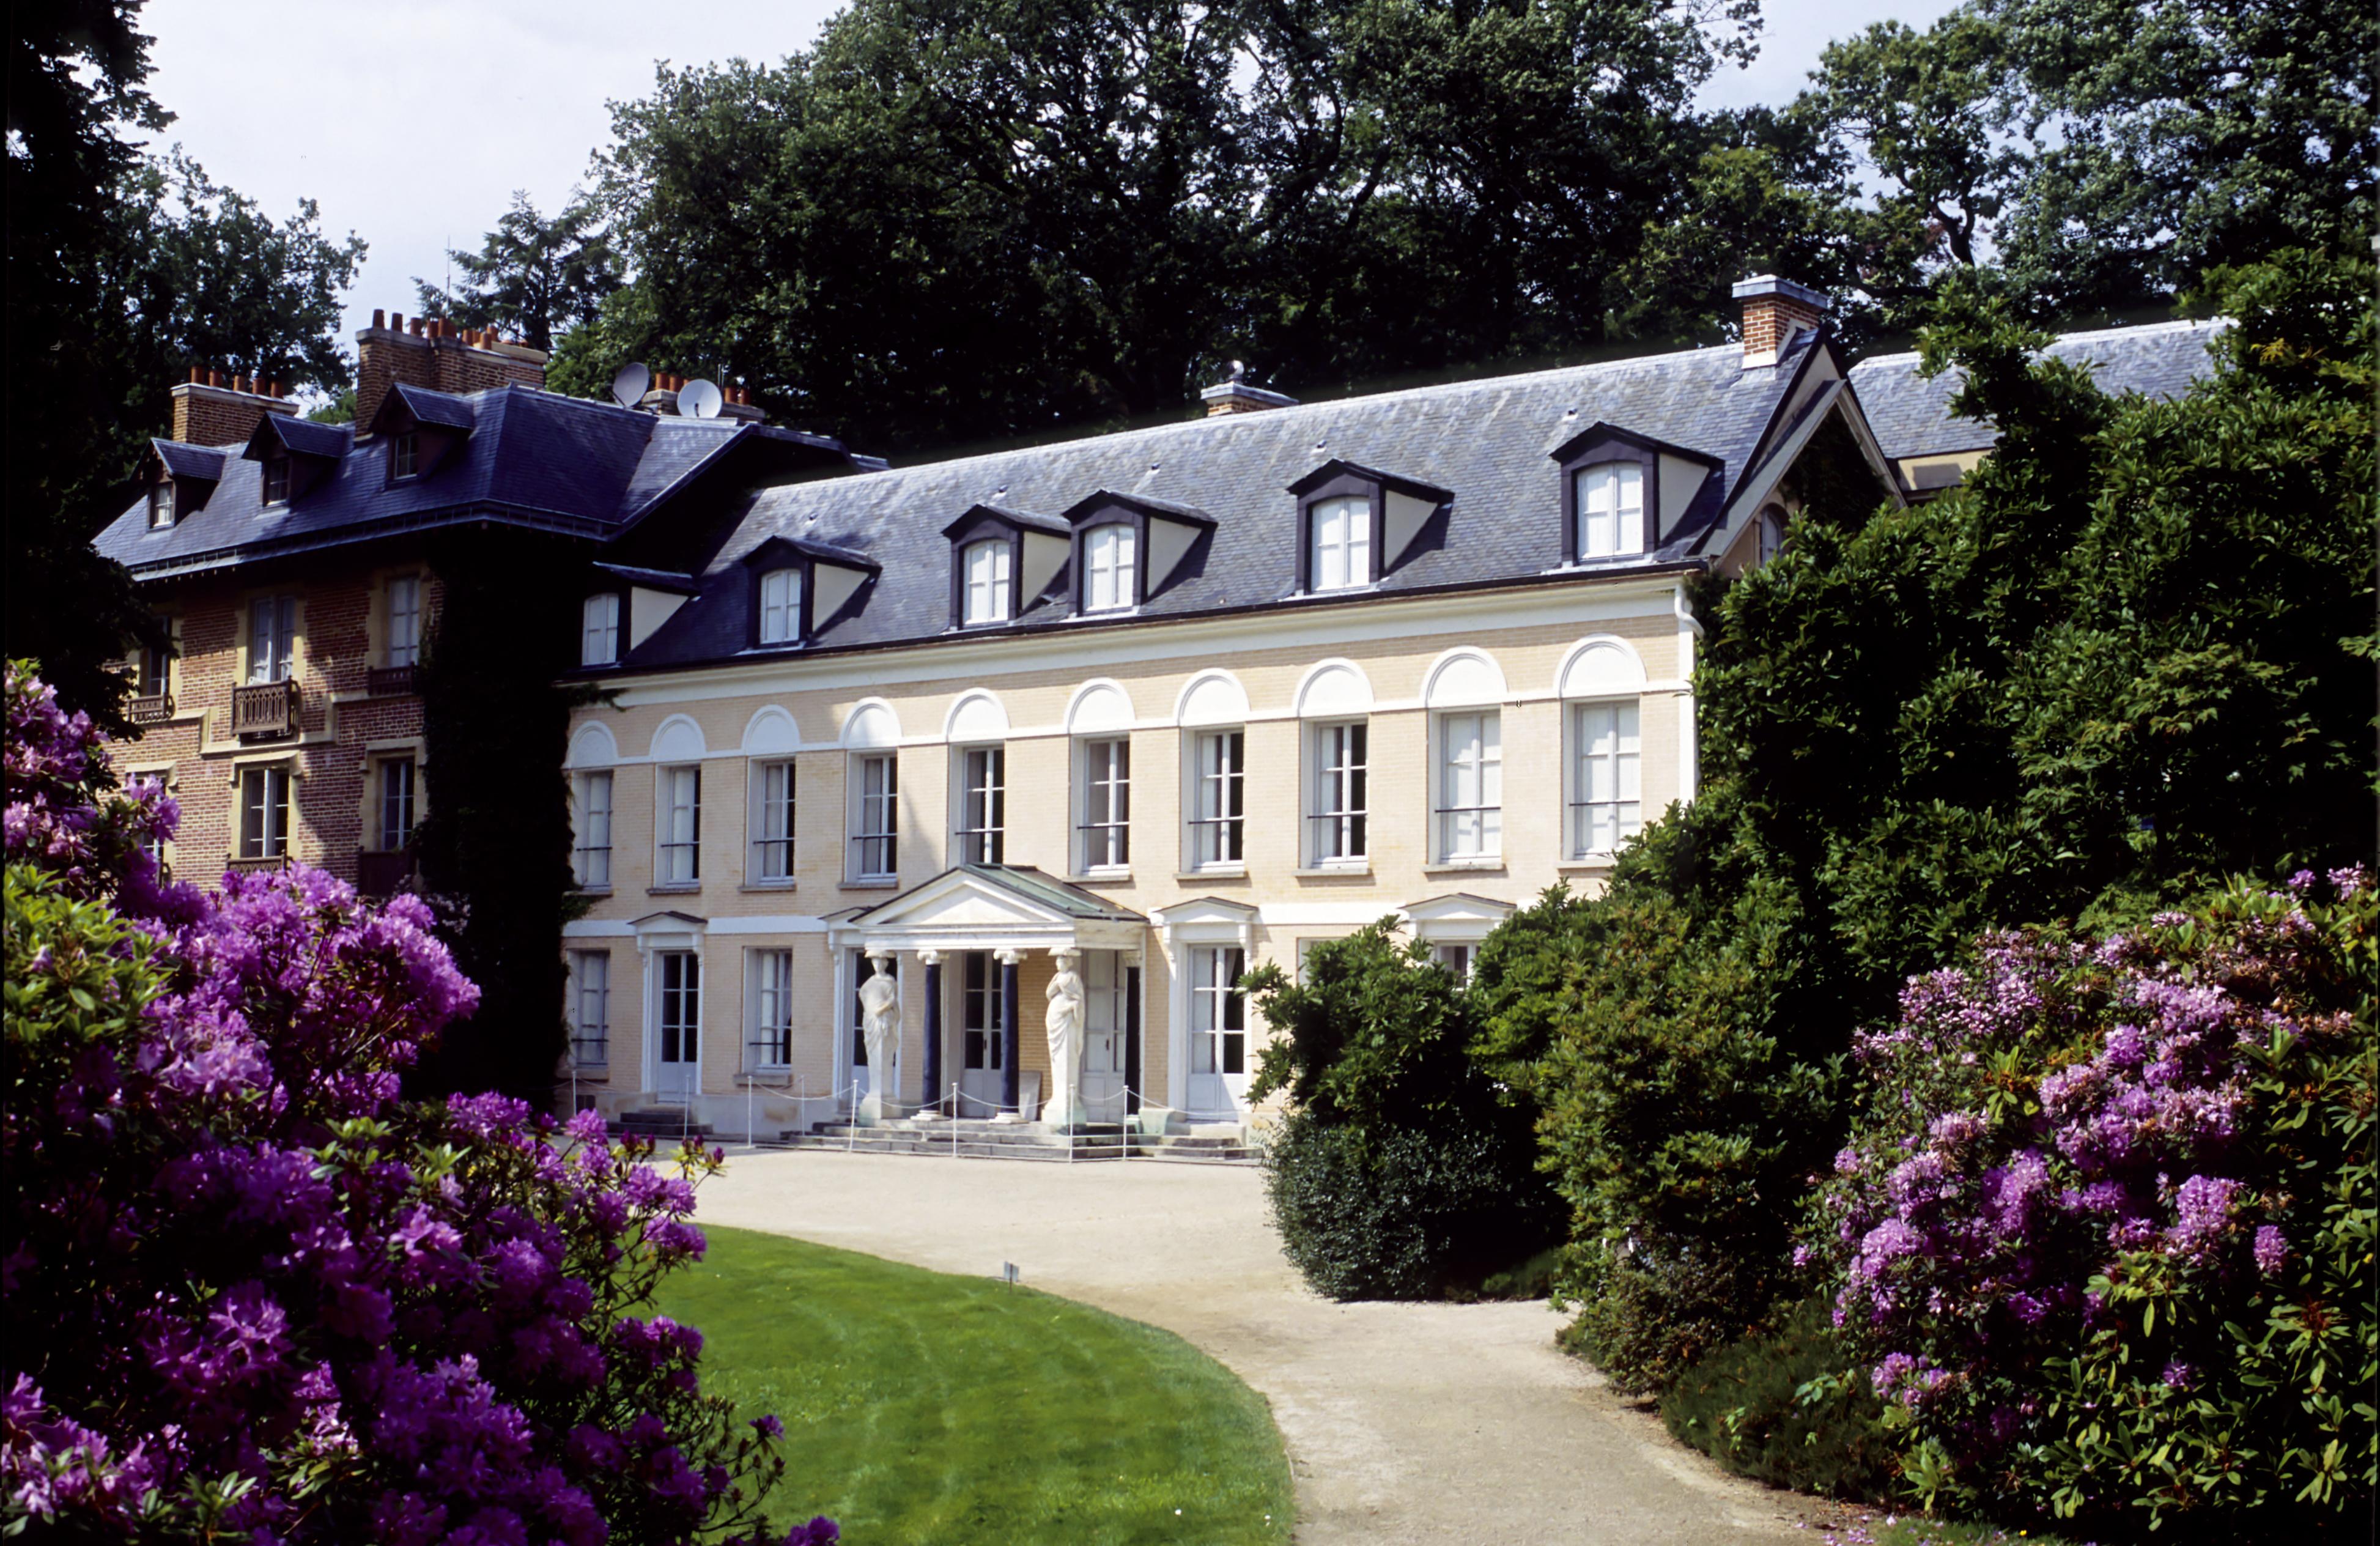 Maison-Chateaubriand